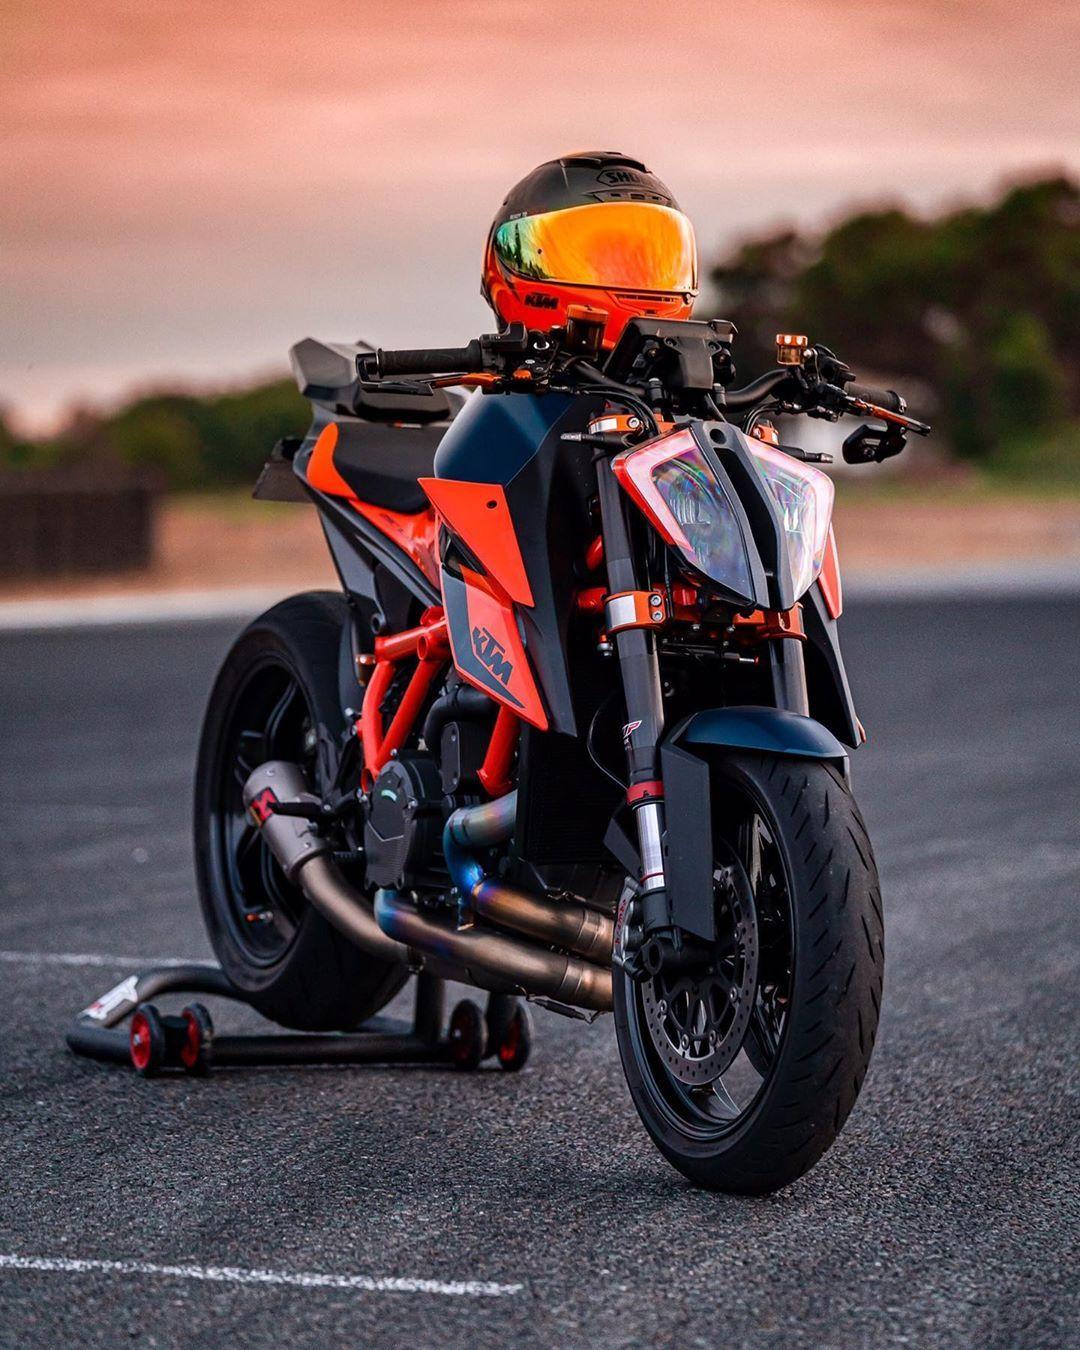 Pin On Motorcycle Get ktm super duke r wallpaper hd